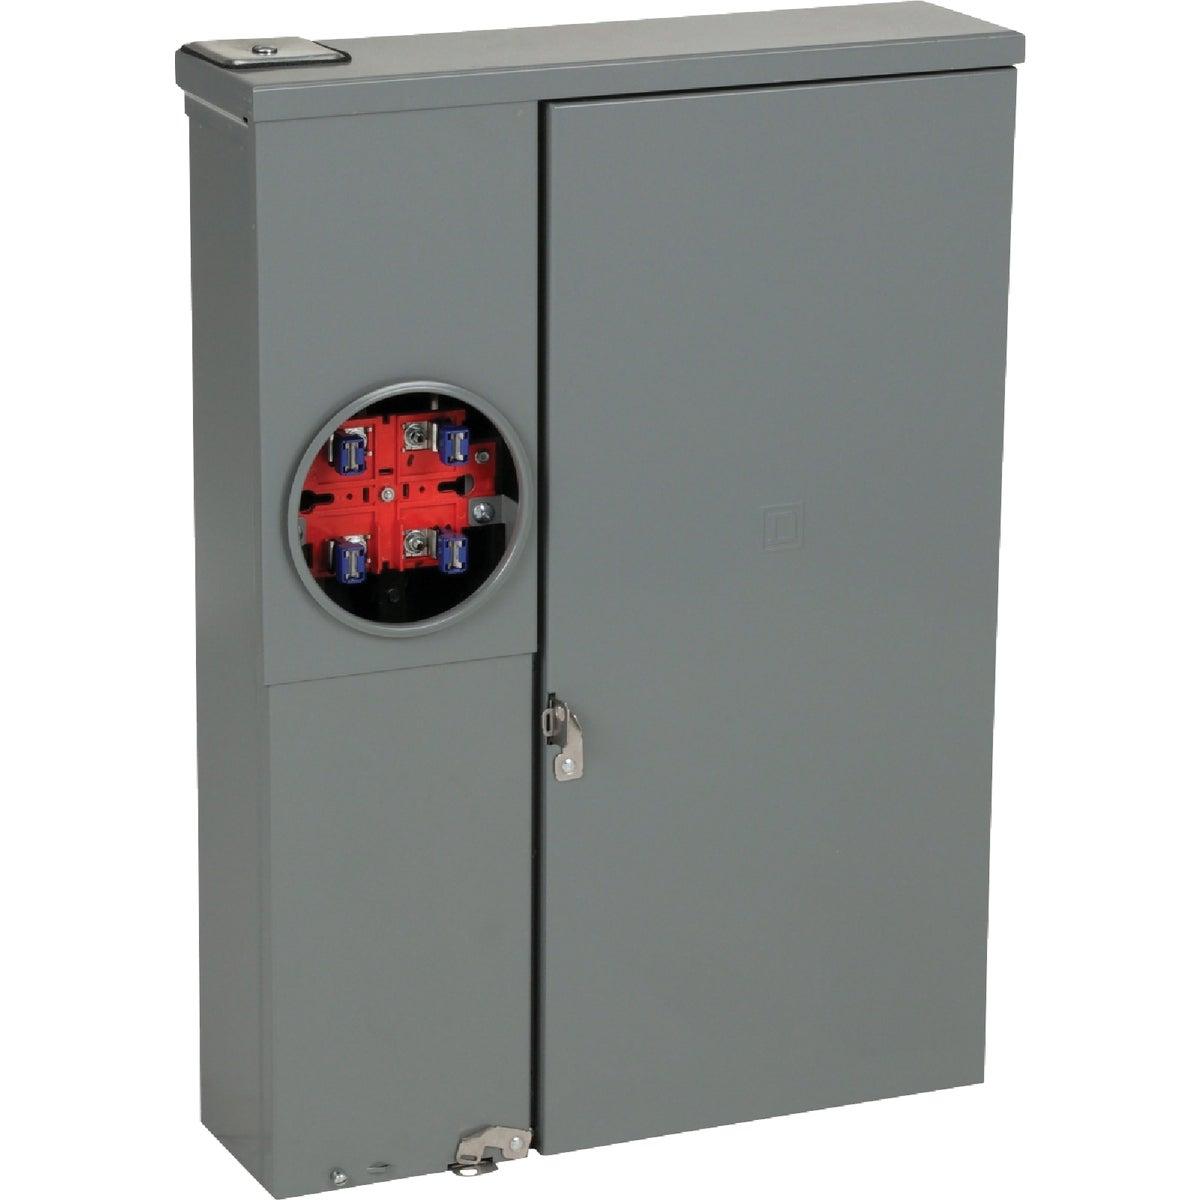 200A Meter Breaker Panel